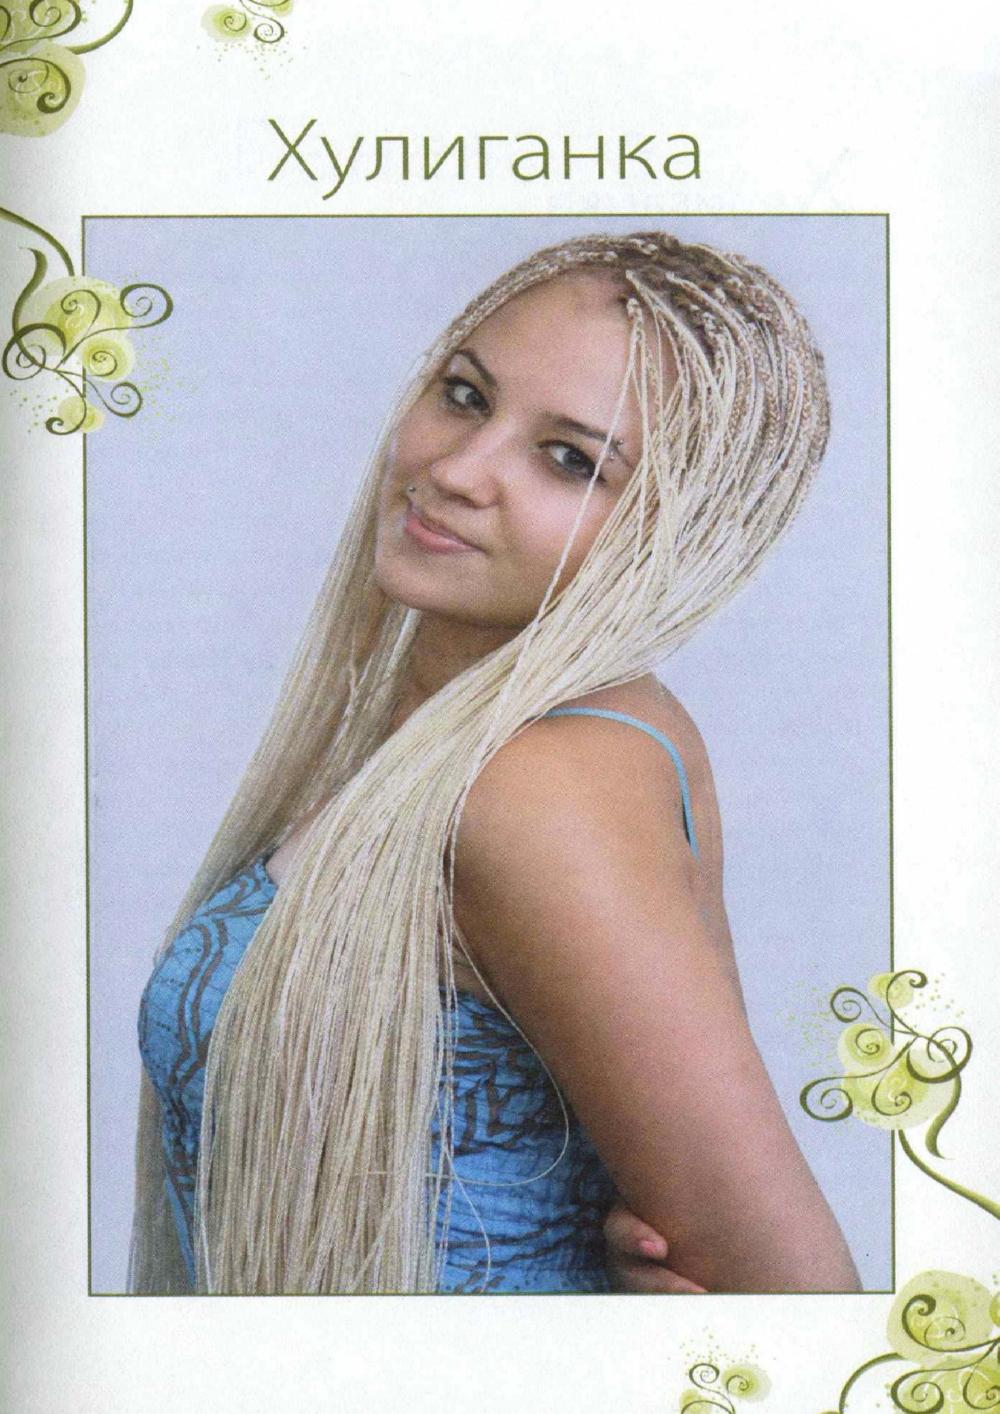 http://i2.imageban.ru/out/2013/11/15/af3e414b15b4717a54d465a2a6035862.jpg